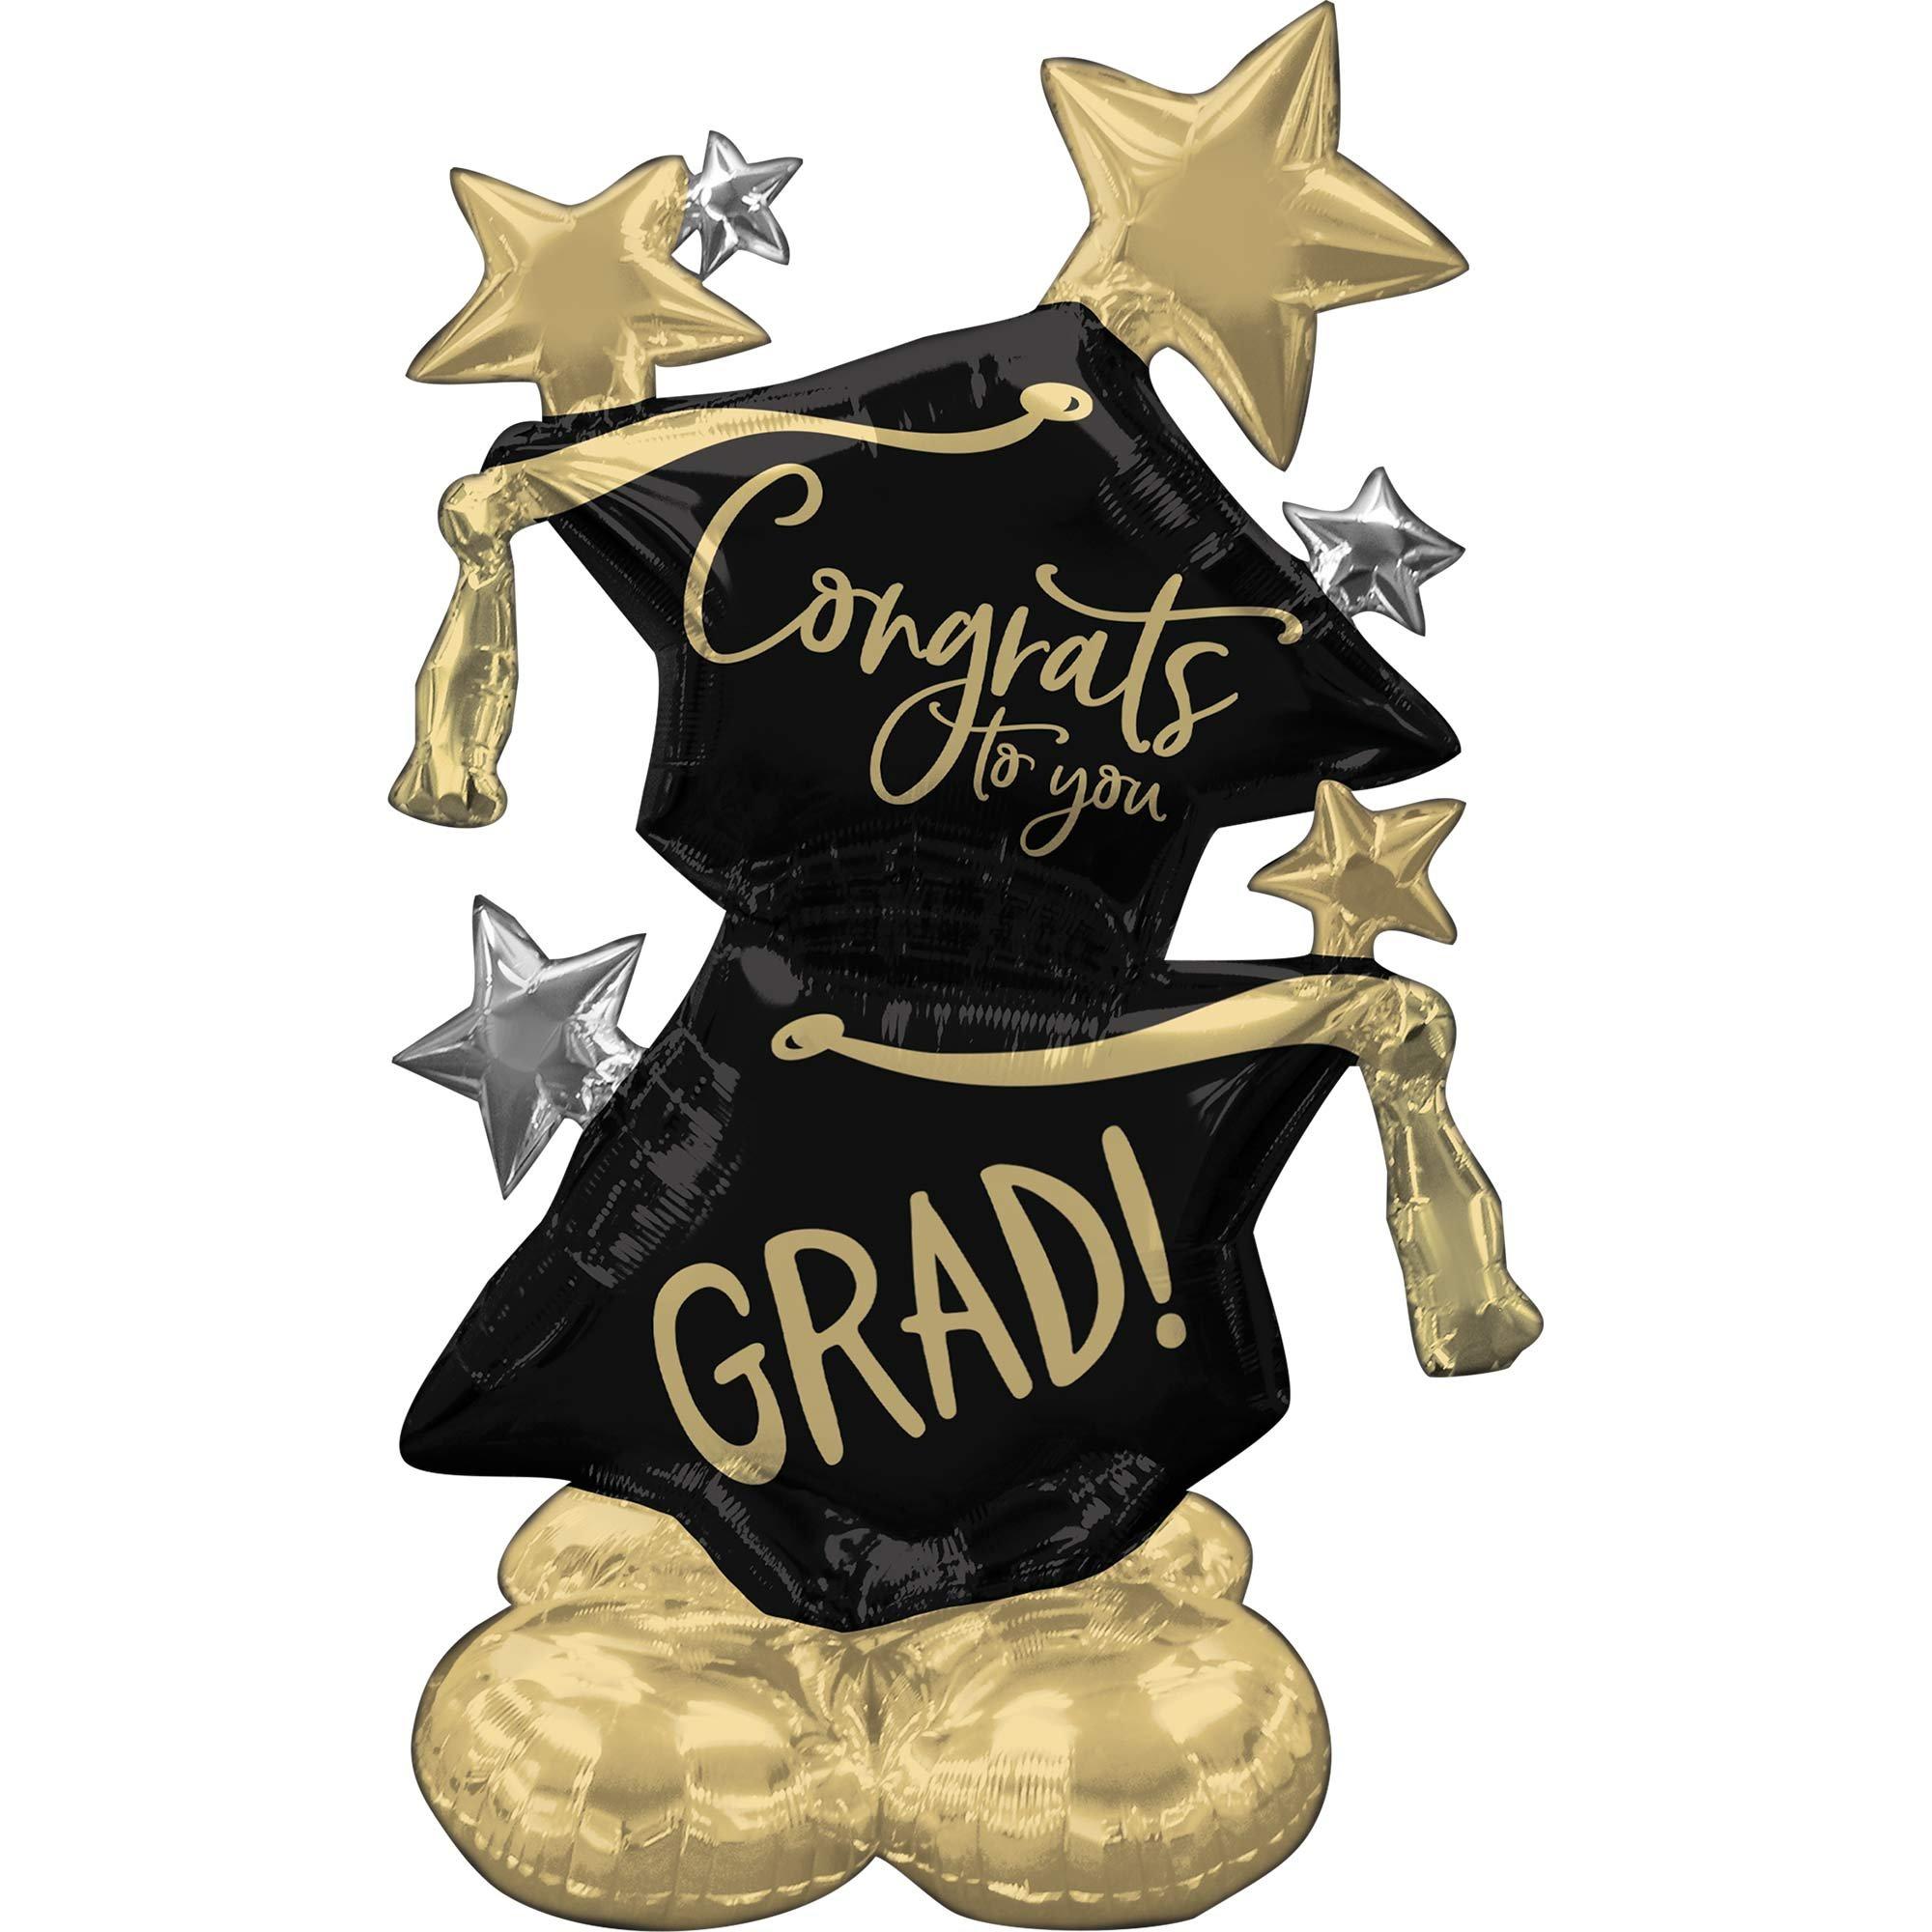 CI:AirLoonz Congrats to You Grad Hats P70